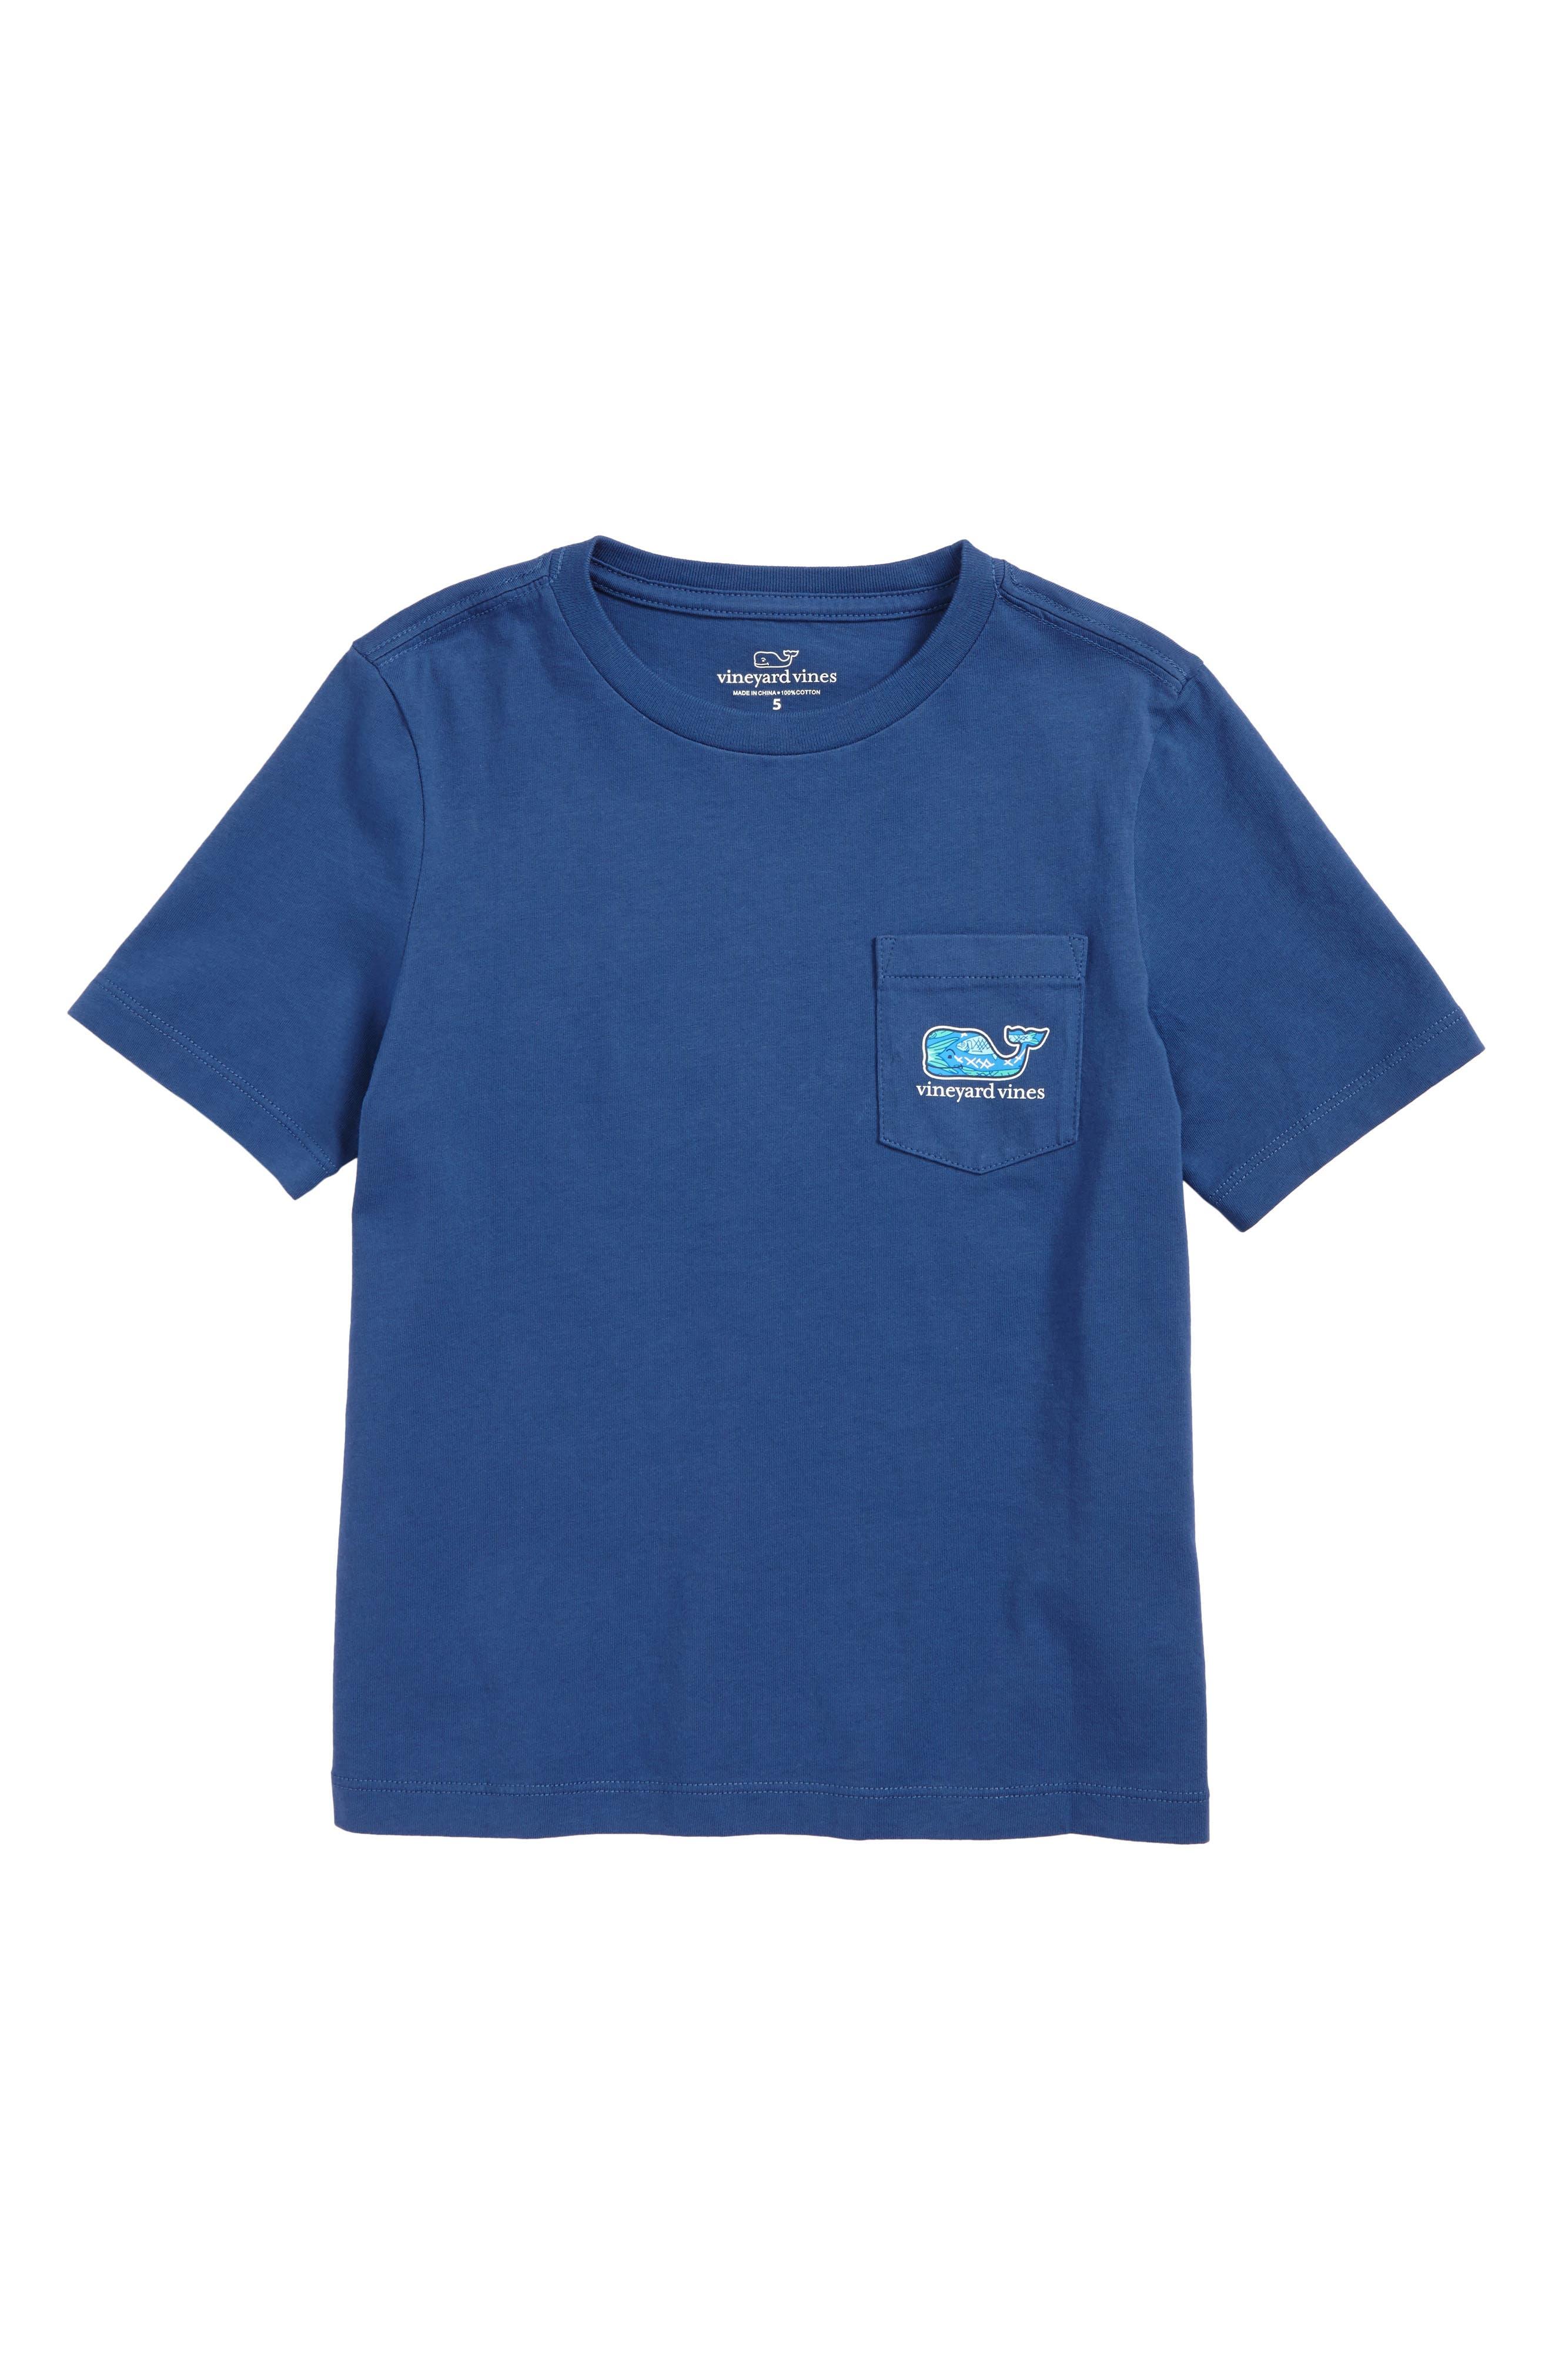 Alternate Image 1 Selected - vineyard vines Fish Scales Whale Pocket T-Shirt (Toddler Boys & Little Boys)